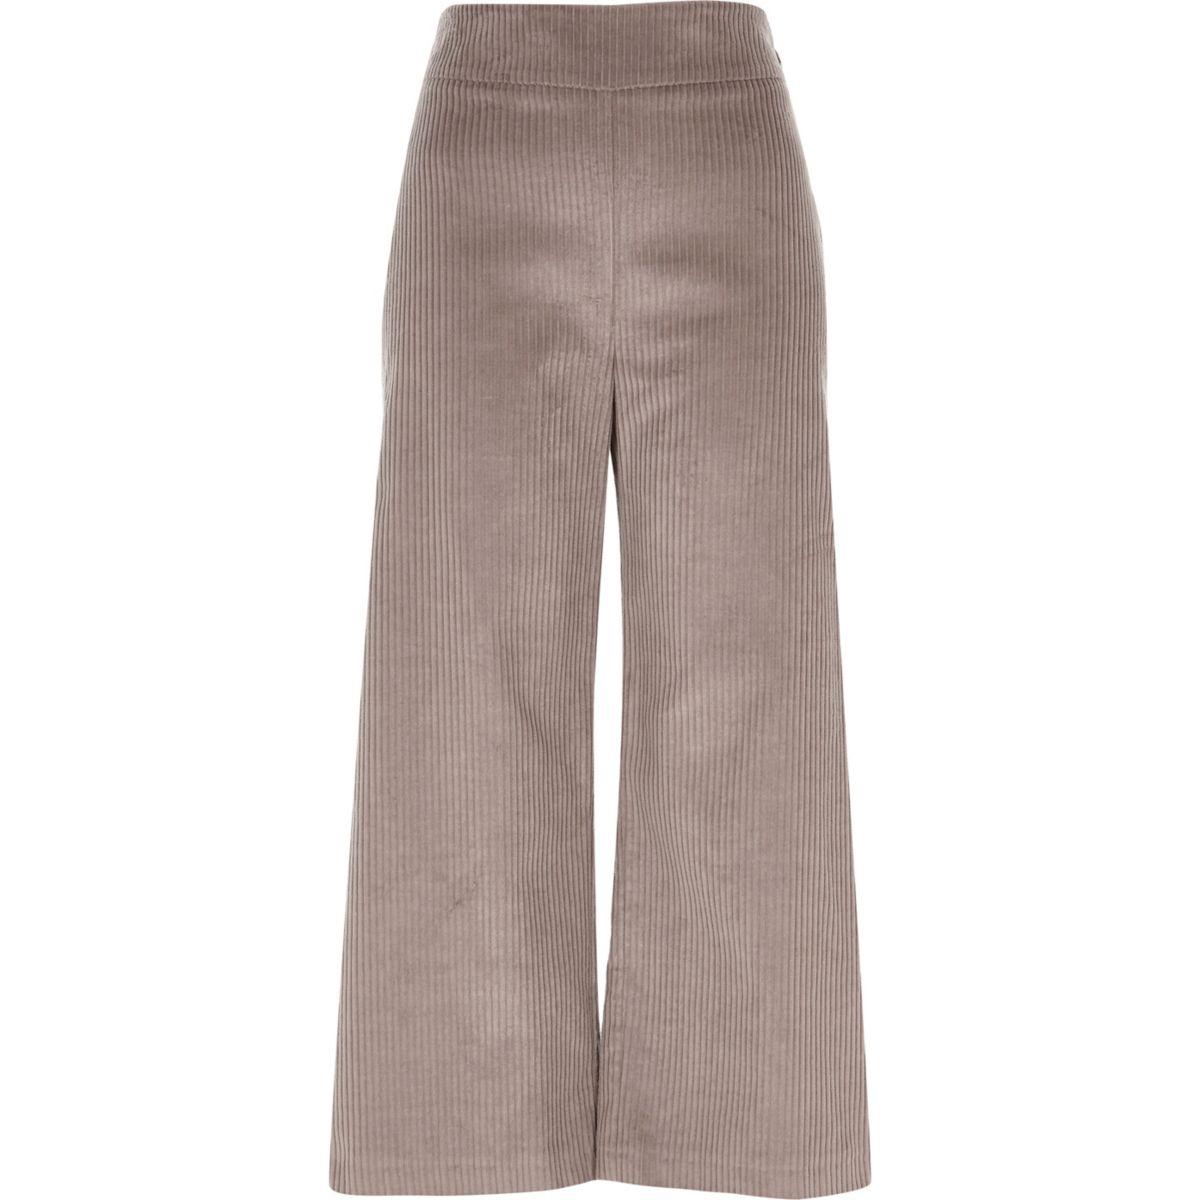 Jupe-culotte en velours côtelé beige